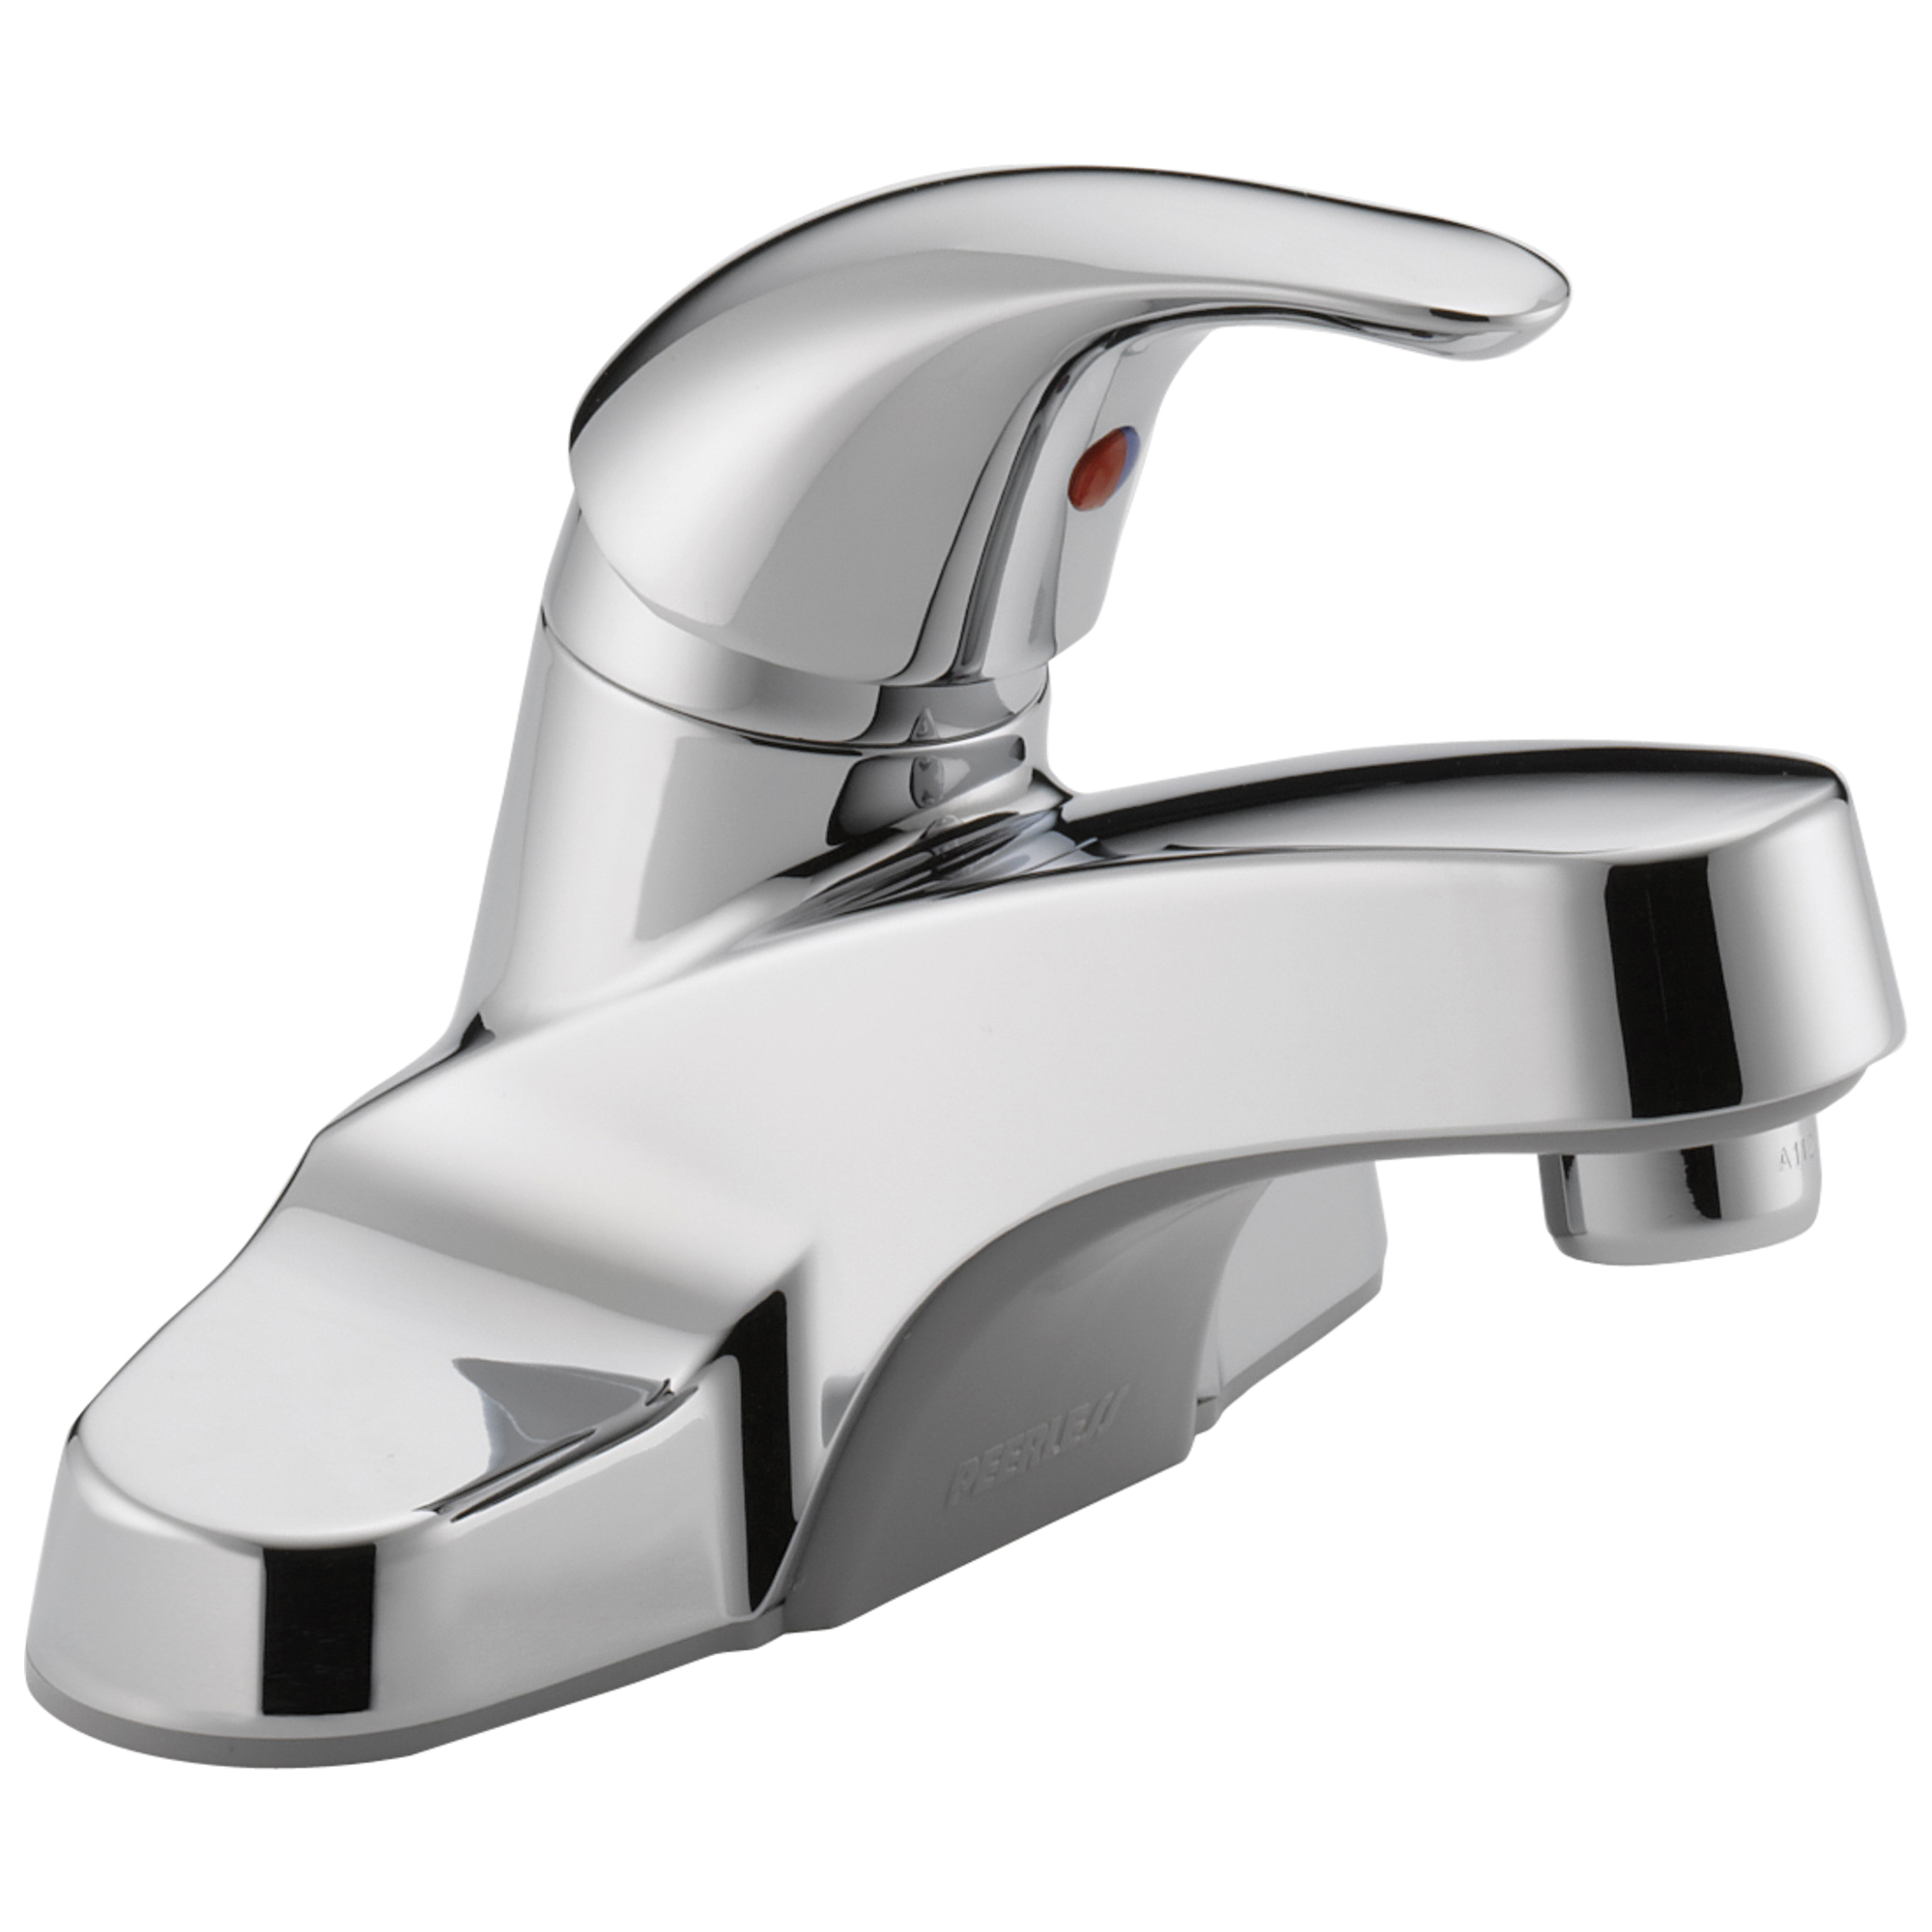 Peerless® P131LF Centerset Lavatory Faucet, Chrome Plated, 1 Handles, 1.2 gpm